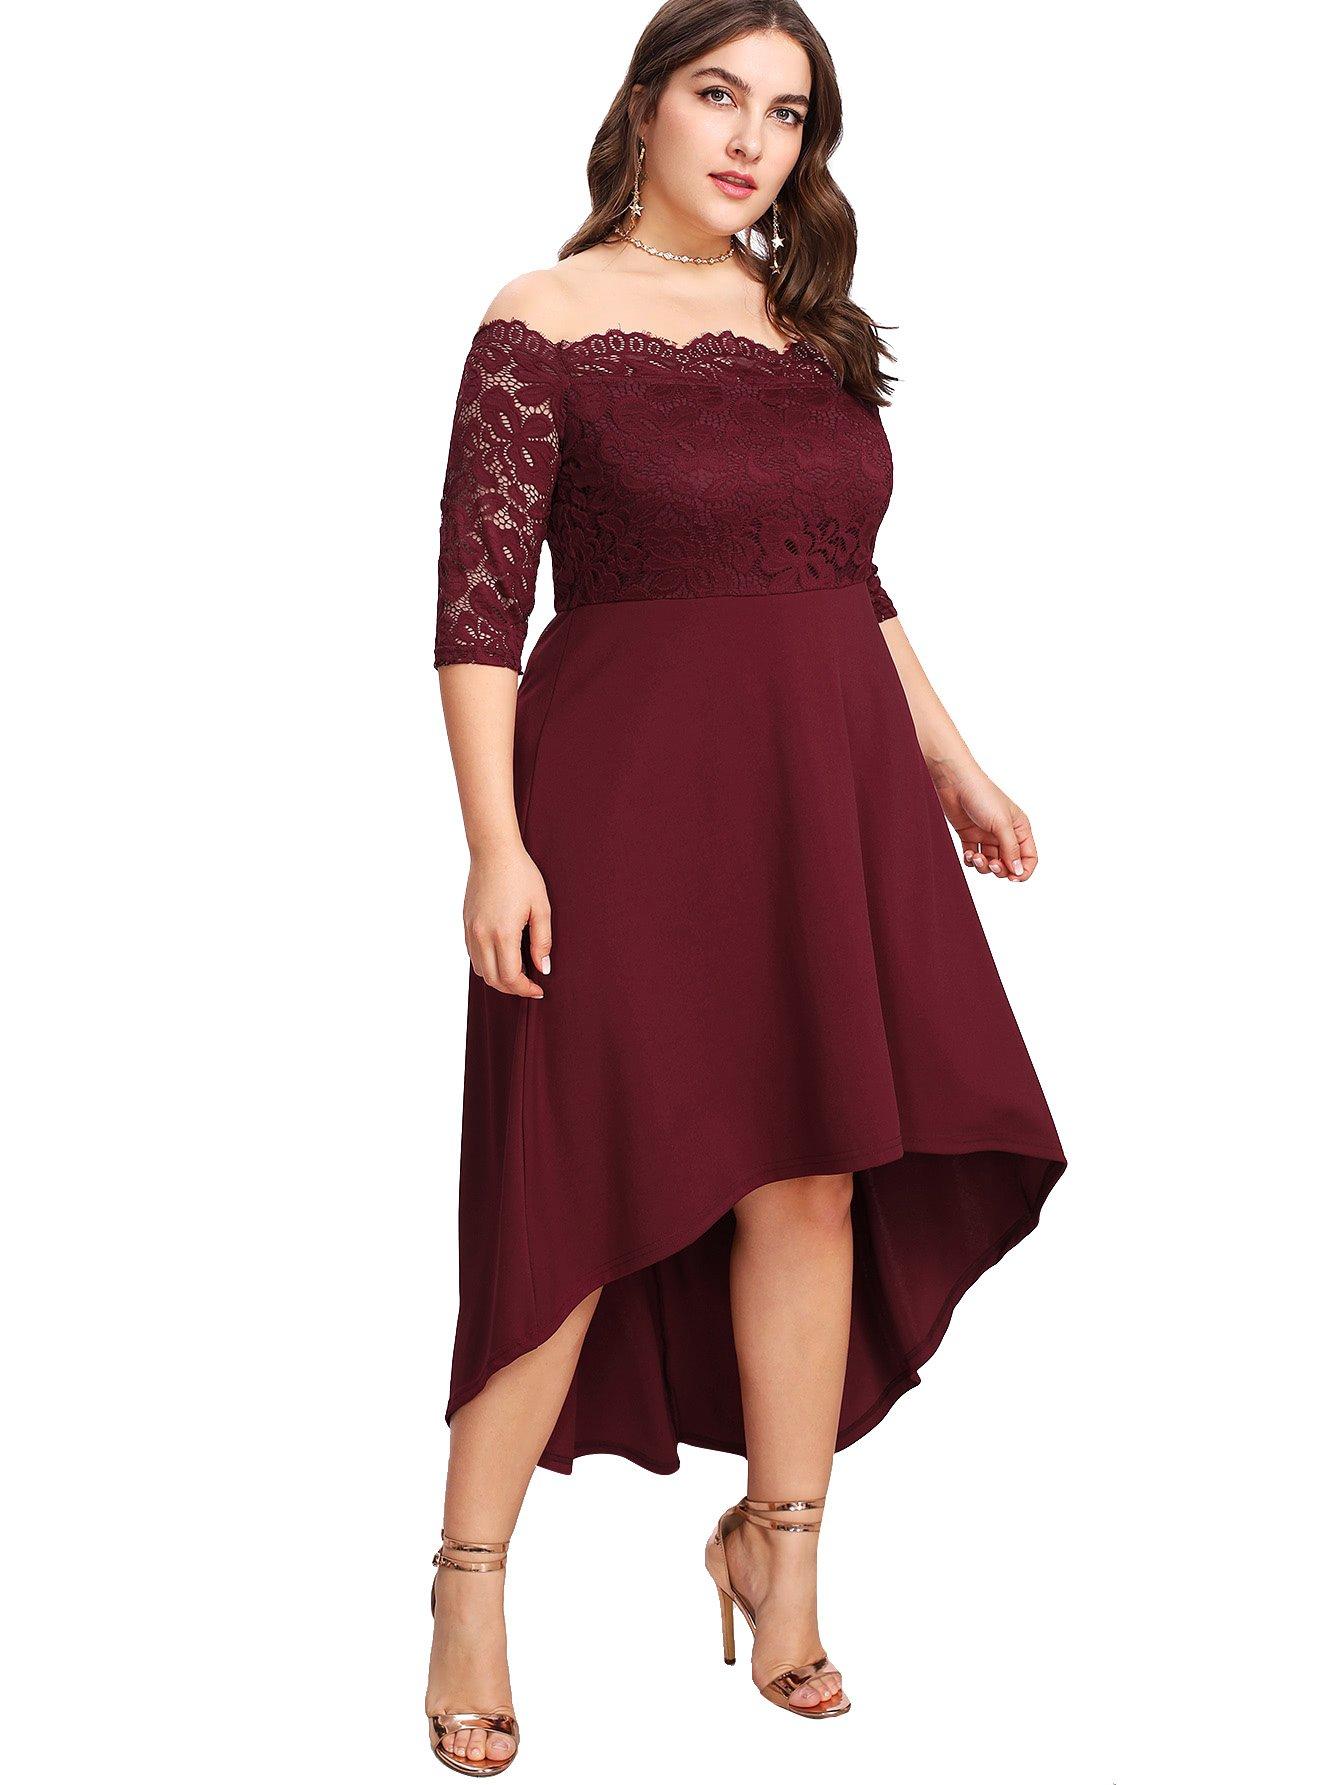 46cf48b90b8 Floerns Women s Plus Size Vintage Lace Dip High Low Cocktail Party Dress  Burgundy XXXXXL